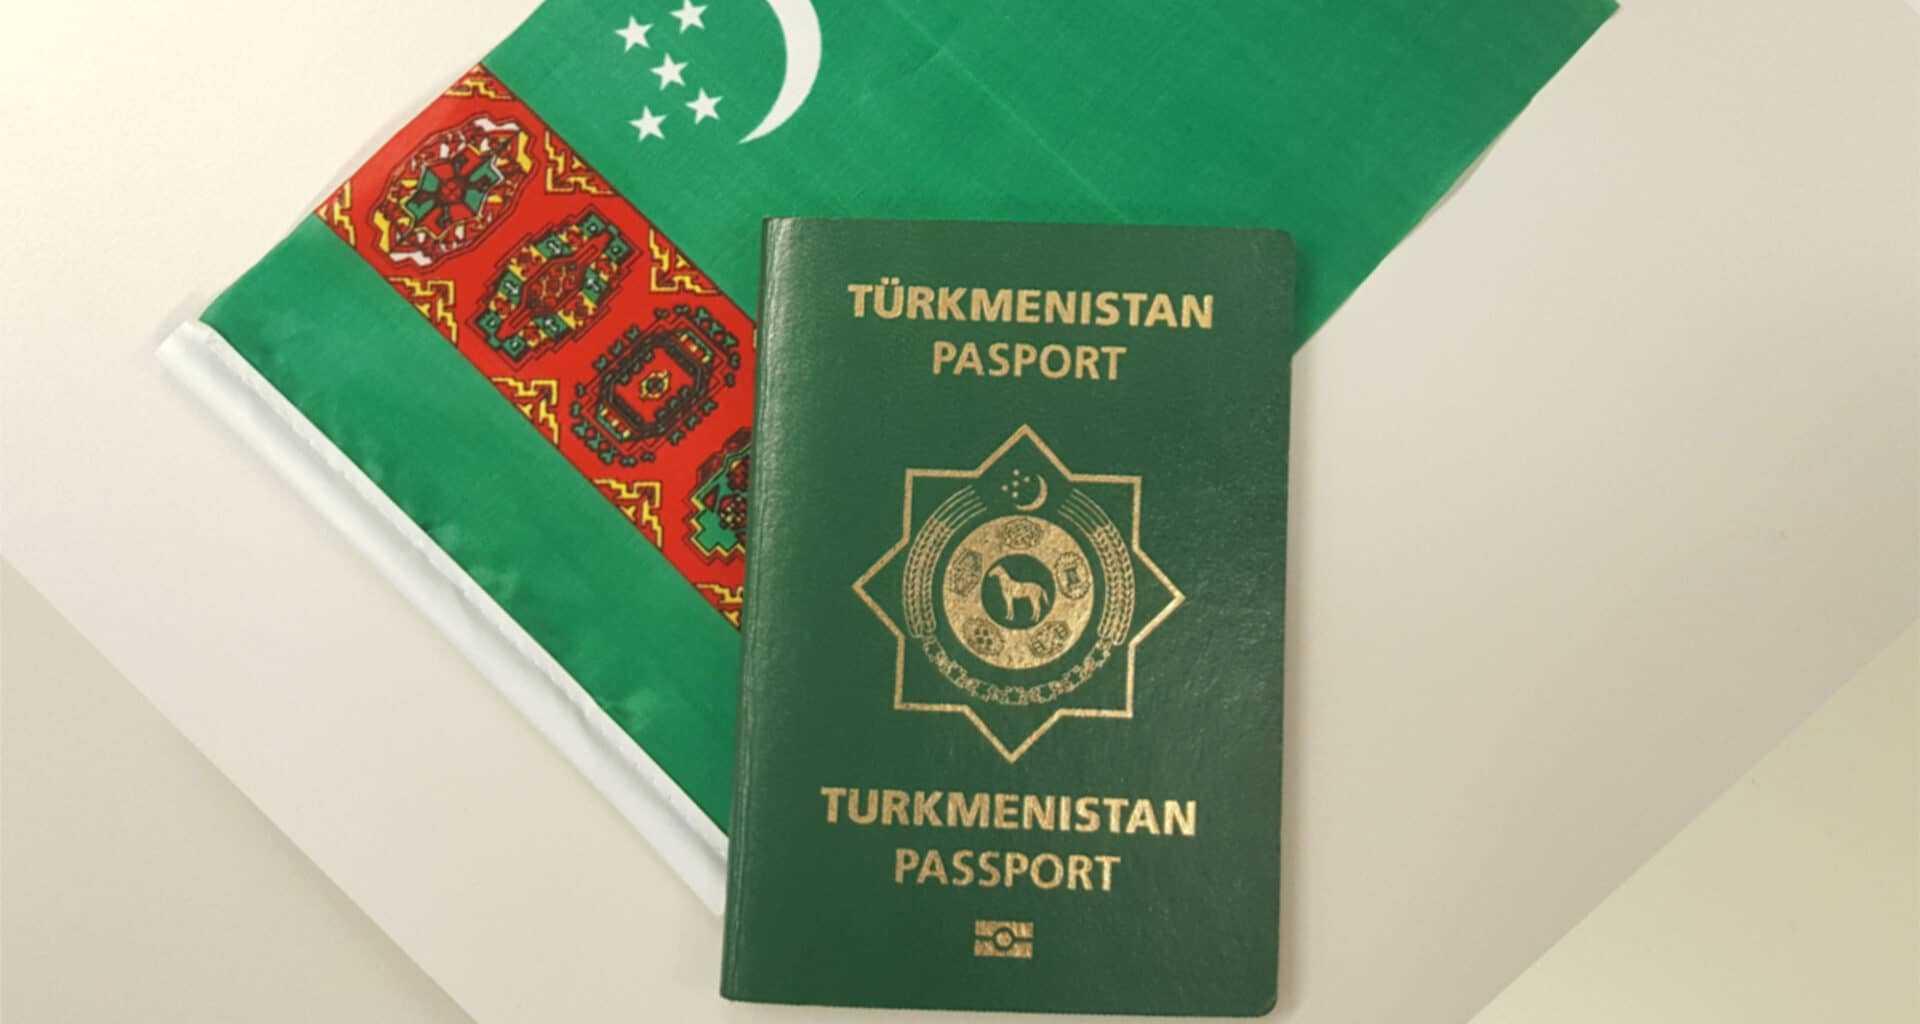 ВНЖ для Туркменистана